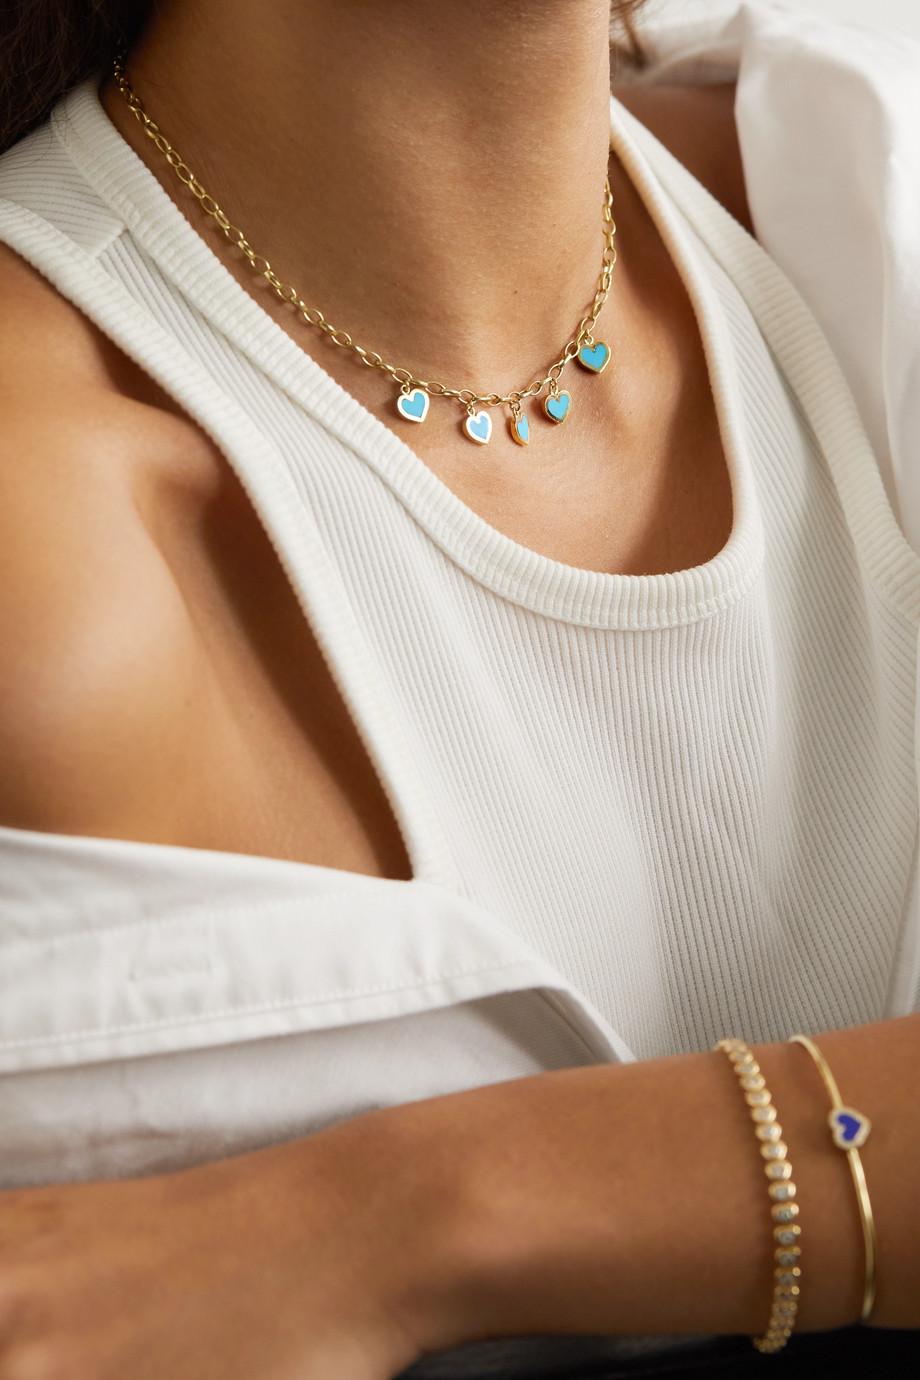 Jennifer Meyer Small Edith 18-karat gold turquoise necklace